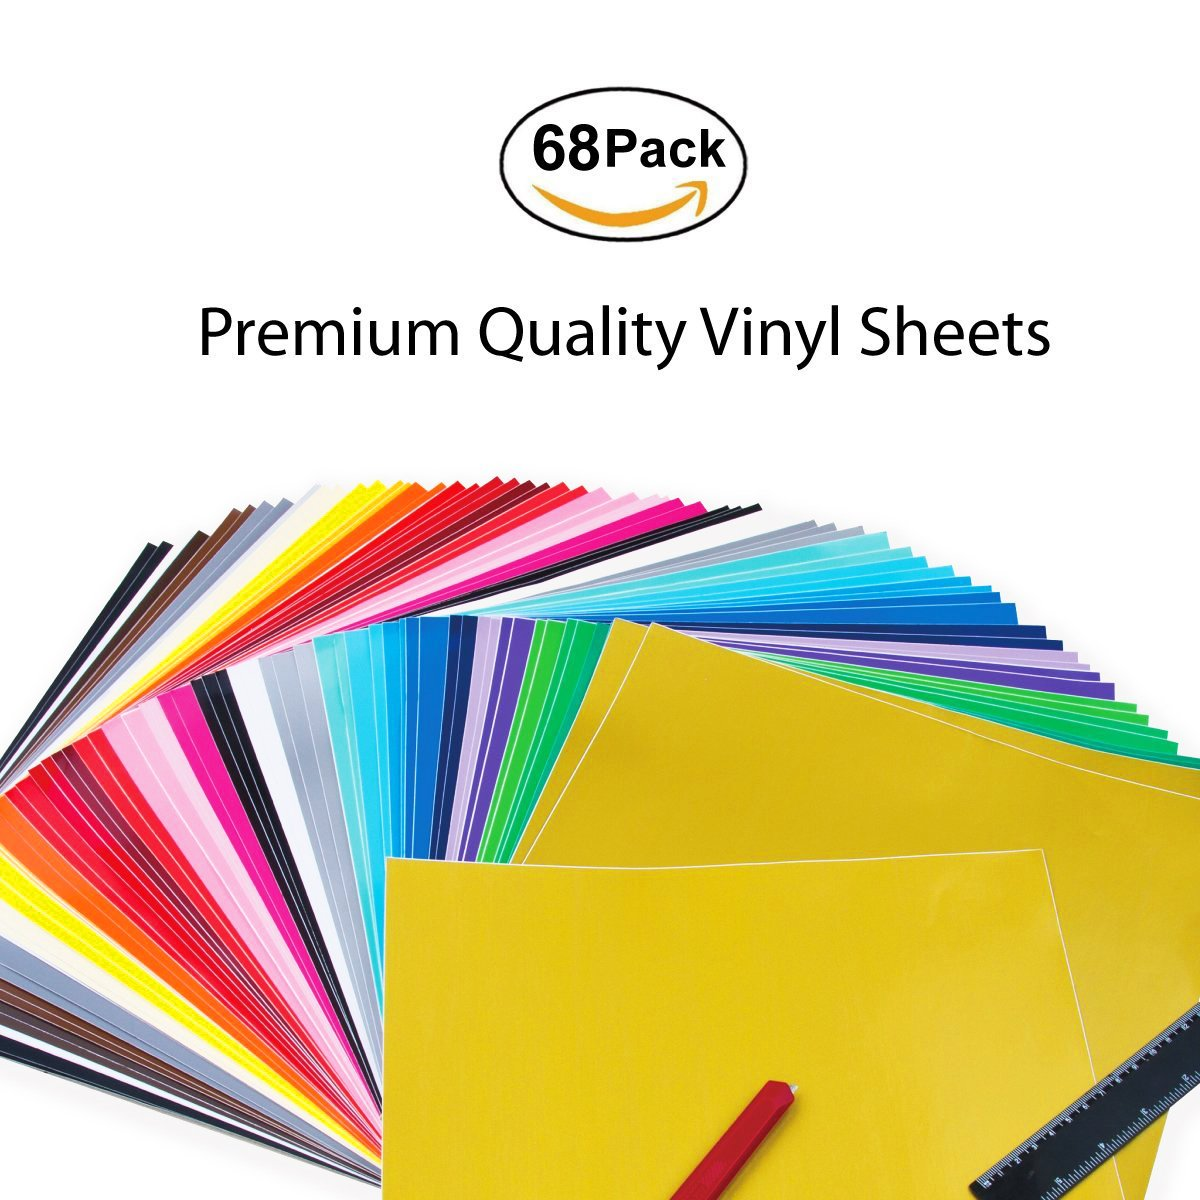 30 Adhesive Craft +10 Transferbandbl/ätter 60 Vinylfolien 30cm*30cm ImnBest 80 Pack Permanent Selbstklebende Vinylfolien Set 10 PCS DIY Craft Vinyl Plotter Zubeh/ör 12x 12